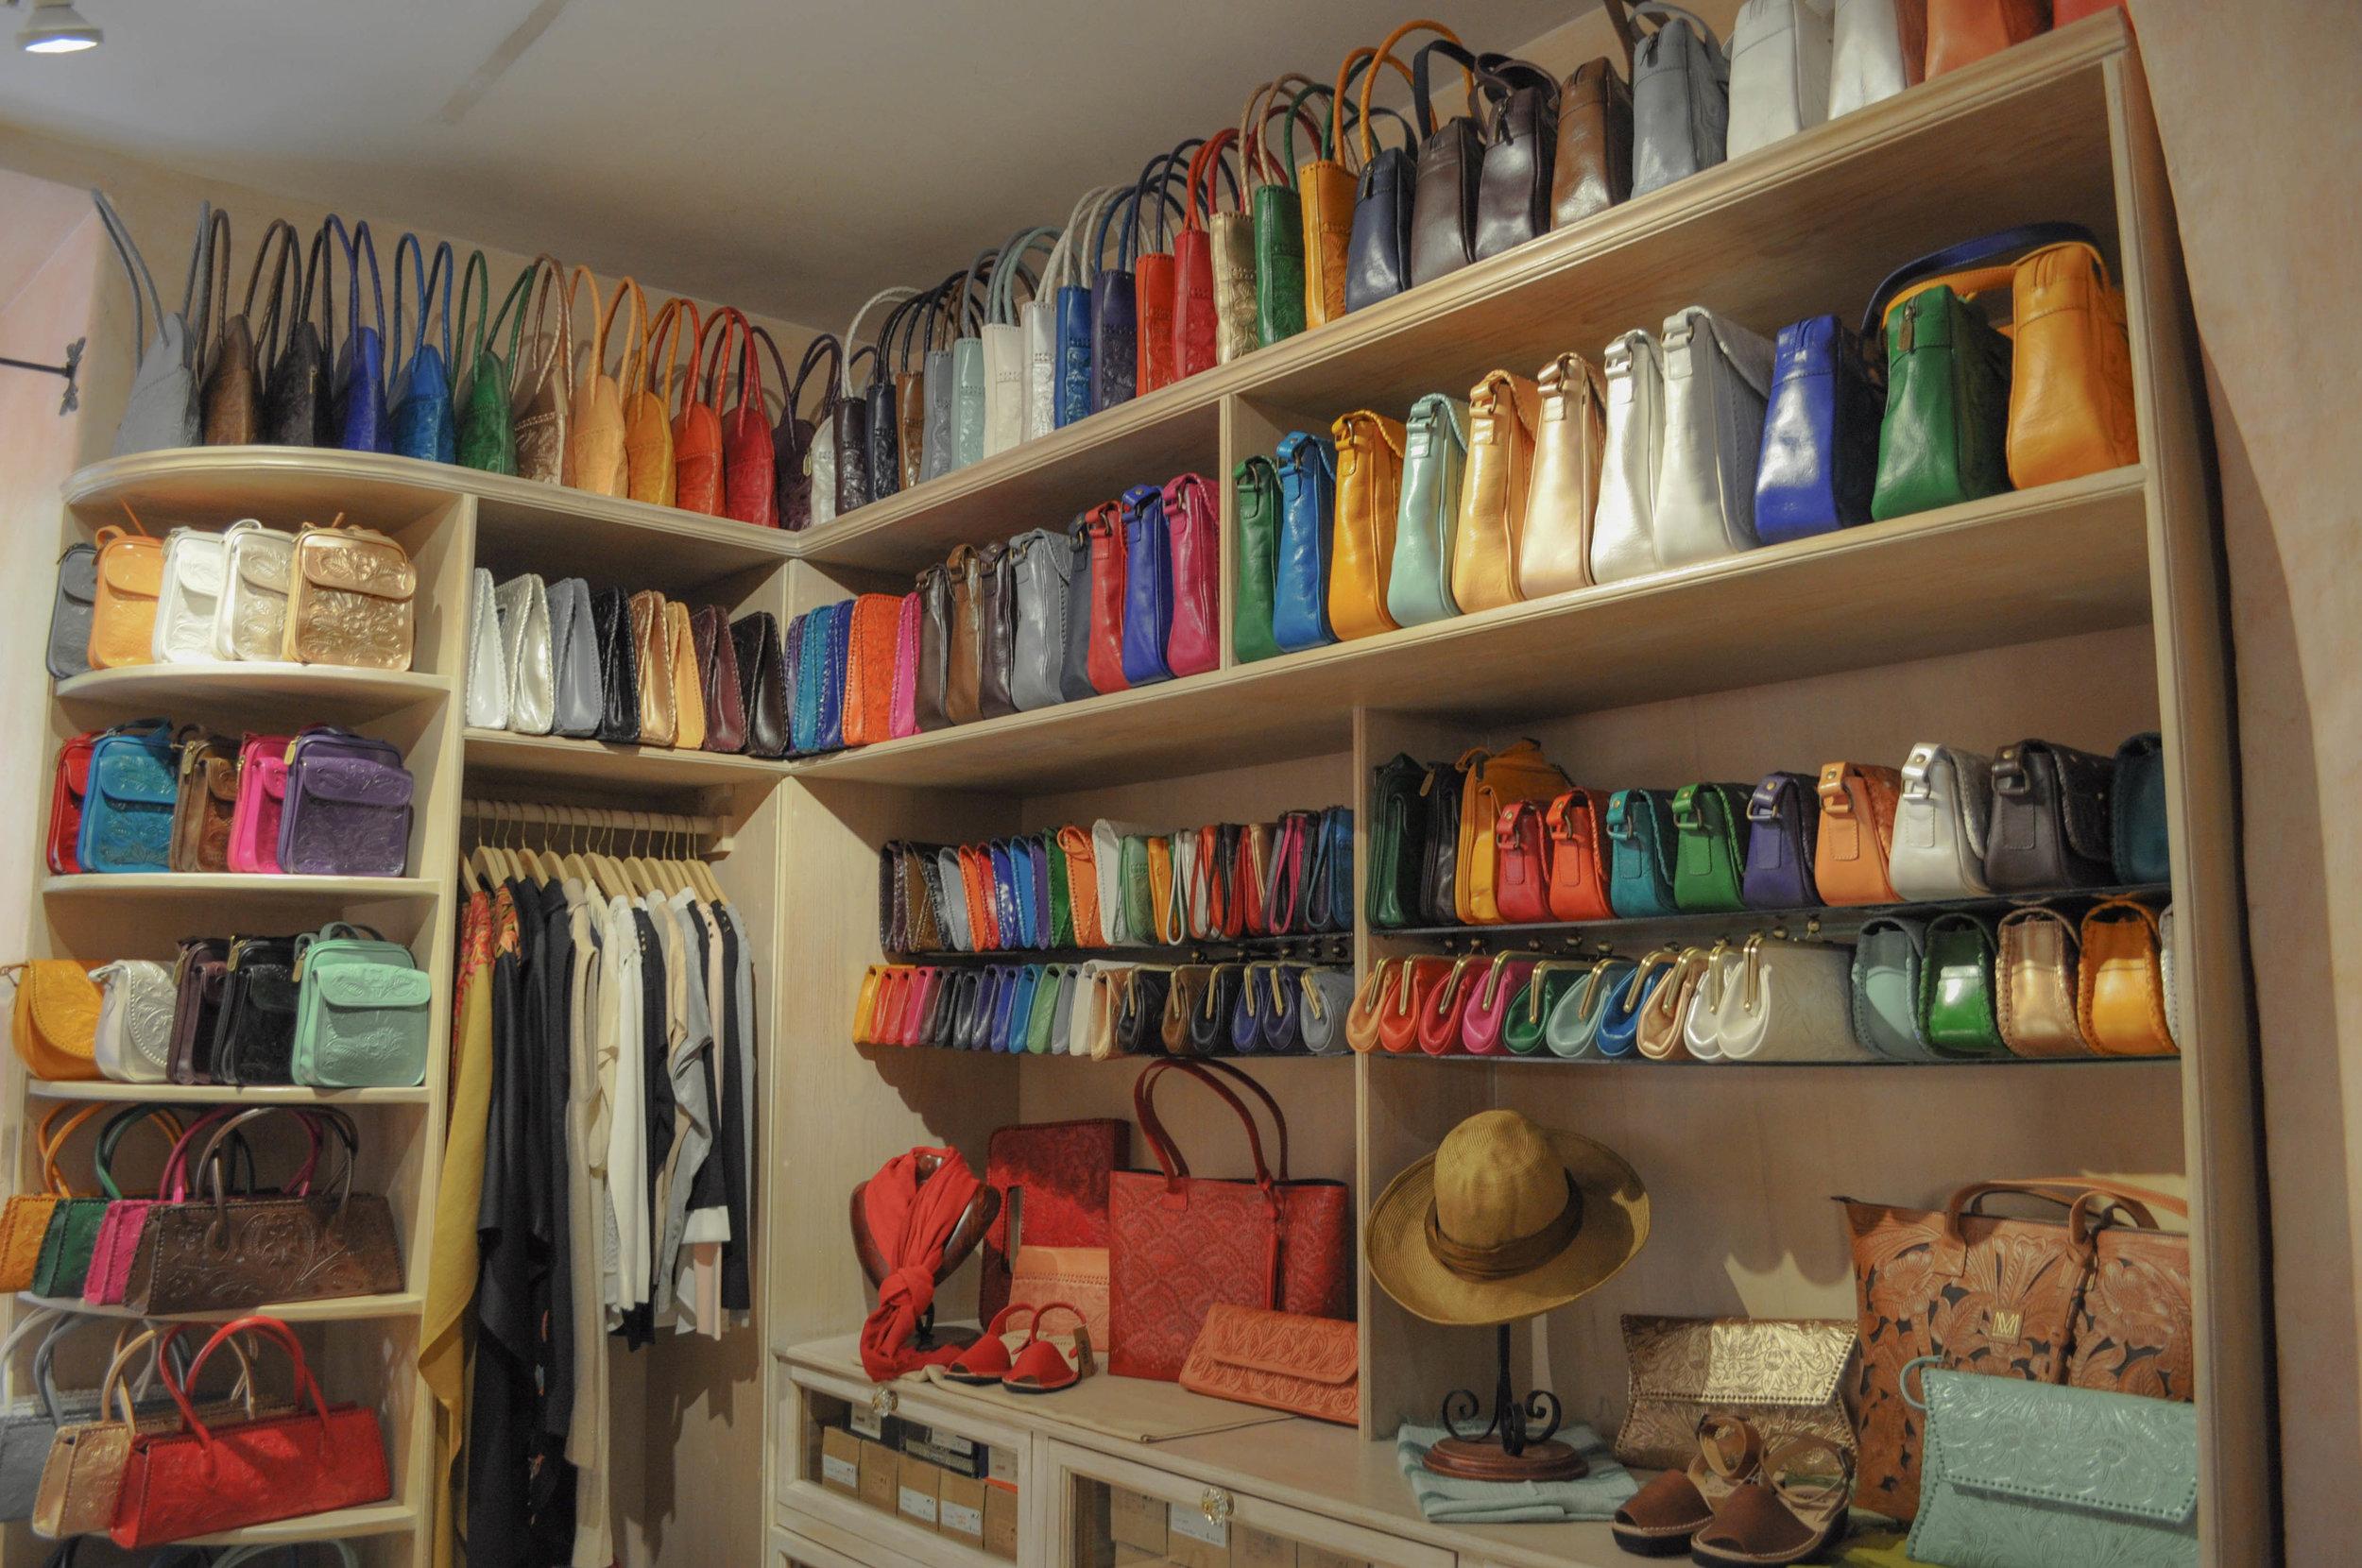 Colorful leather handbags